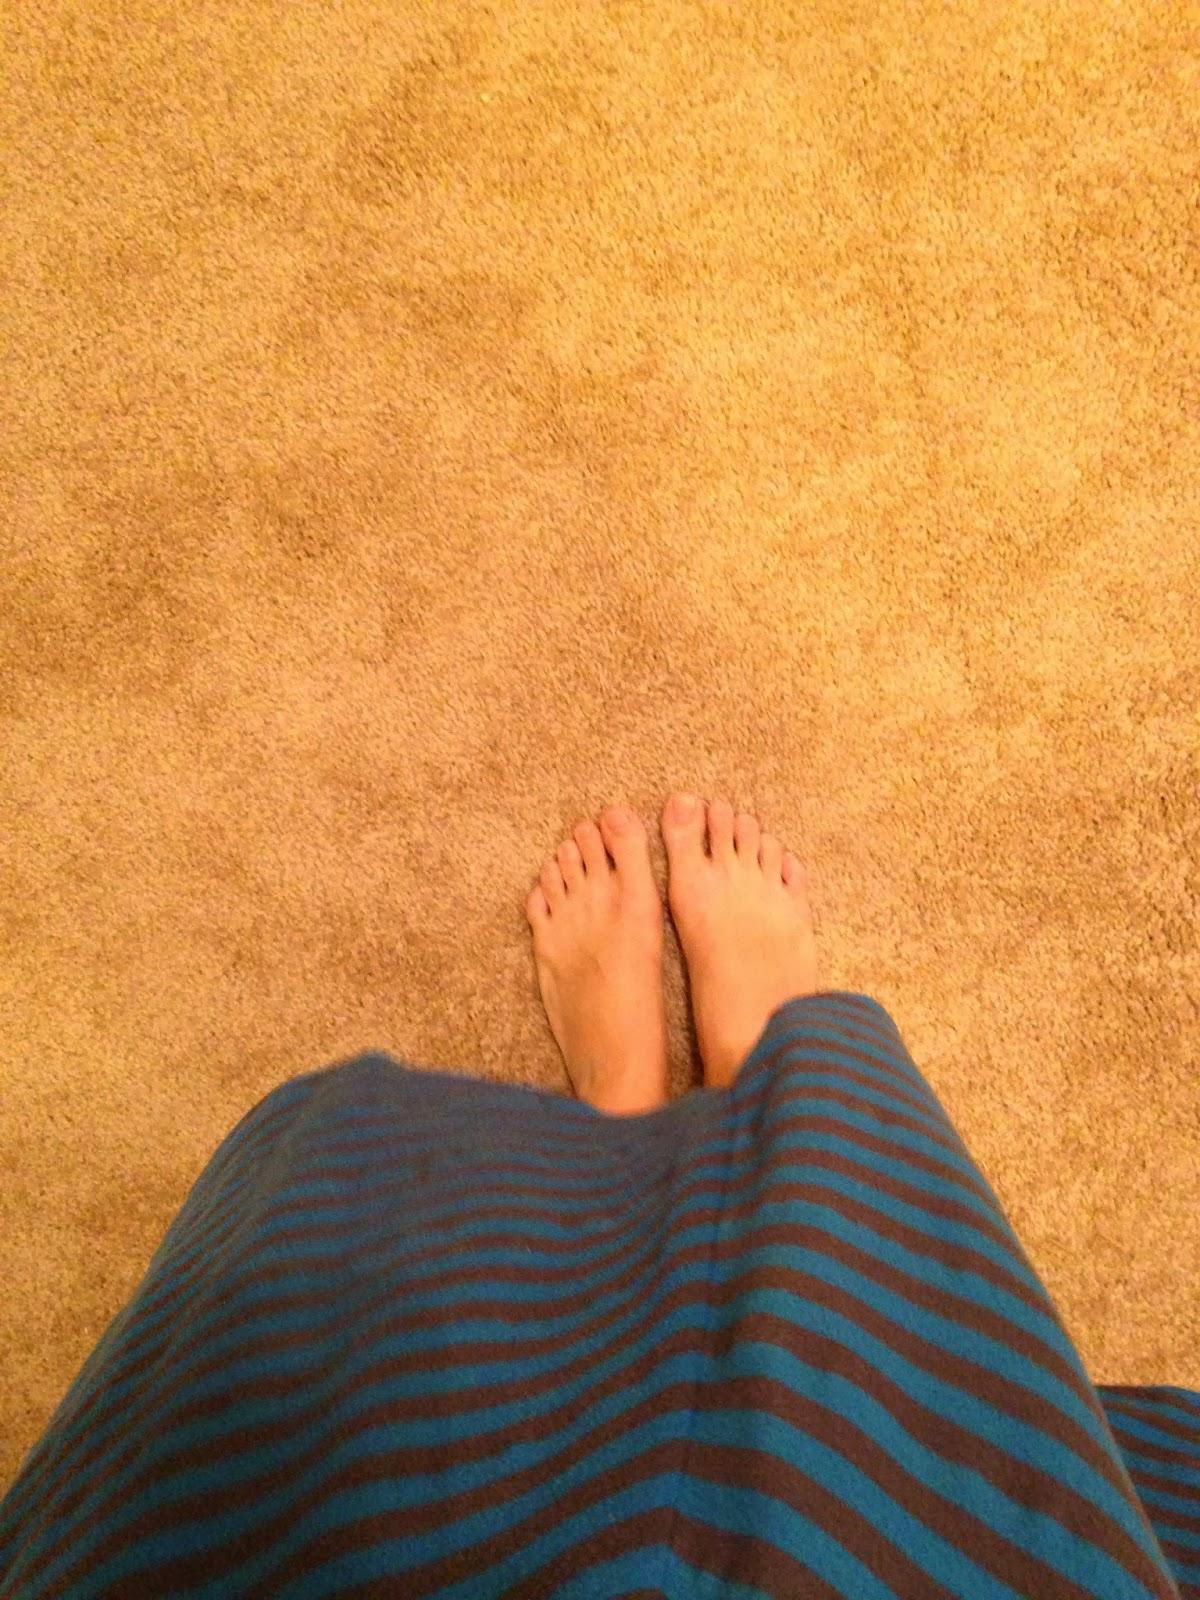 Excellent Temporary Hard Floor Over Carpet Images - Carpet ...